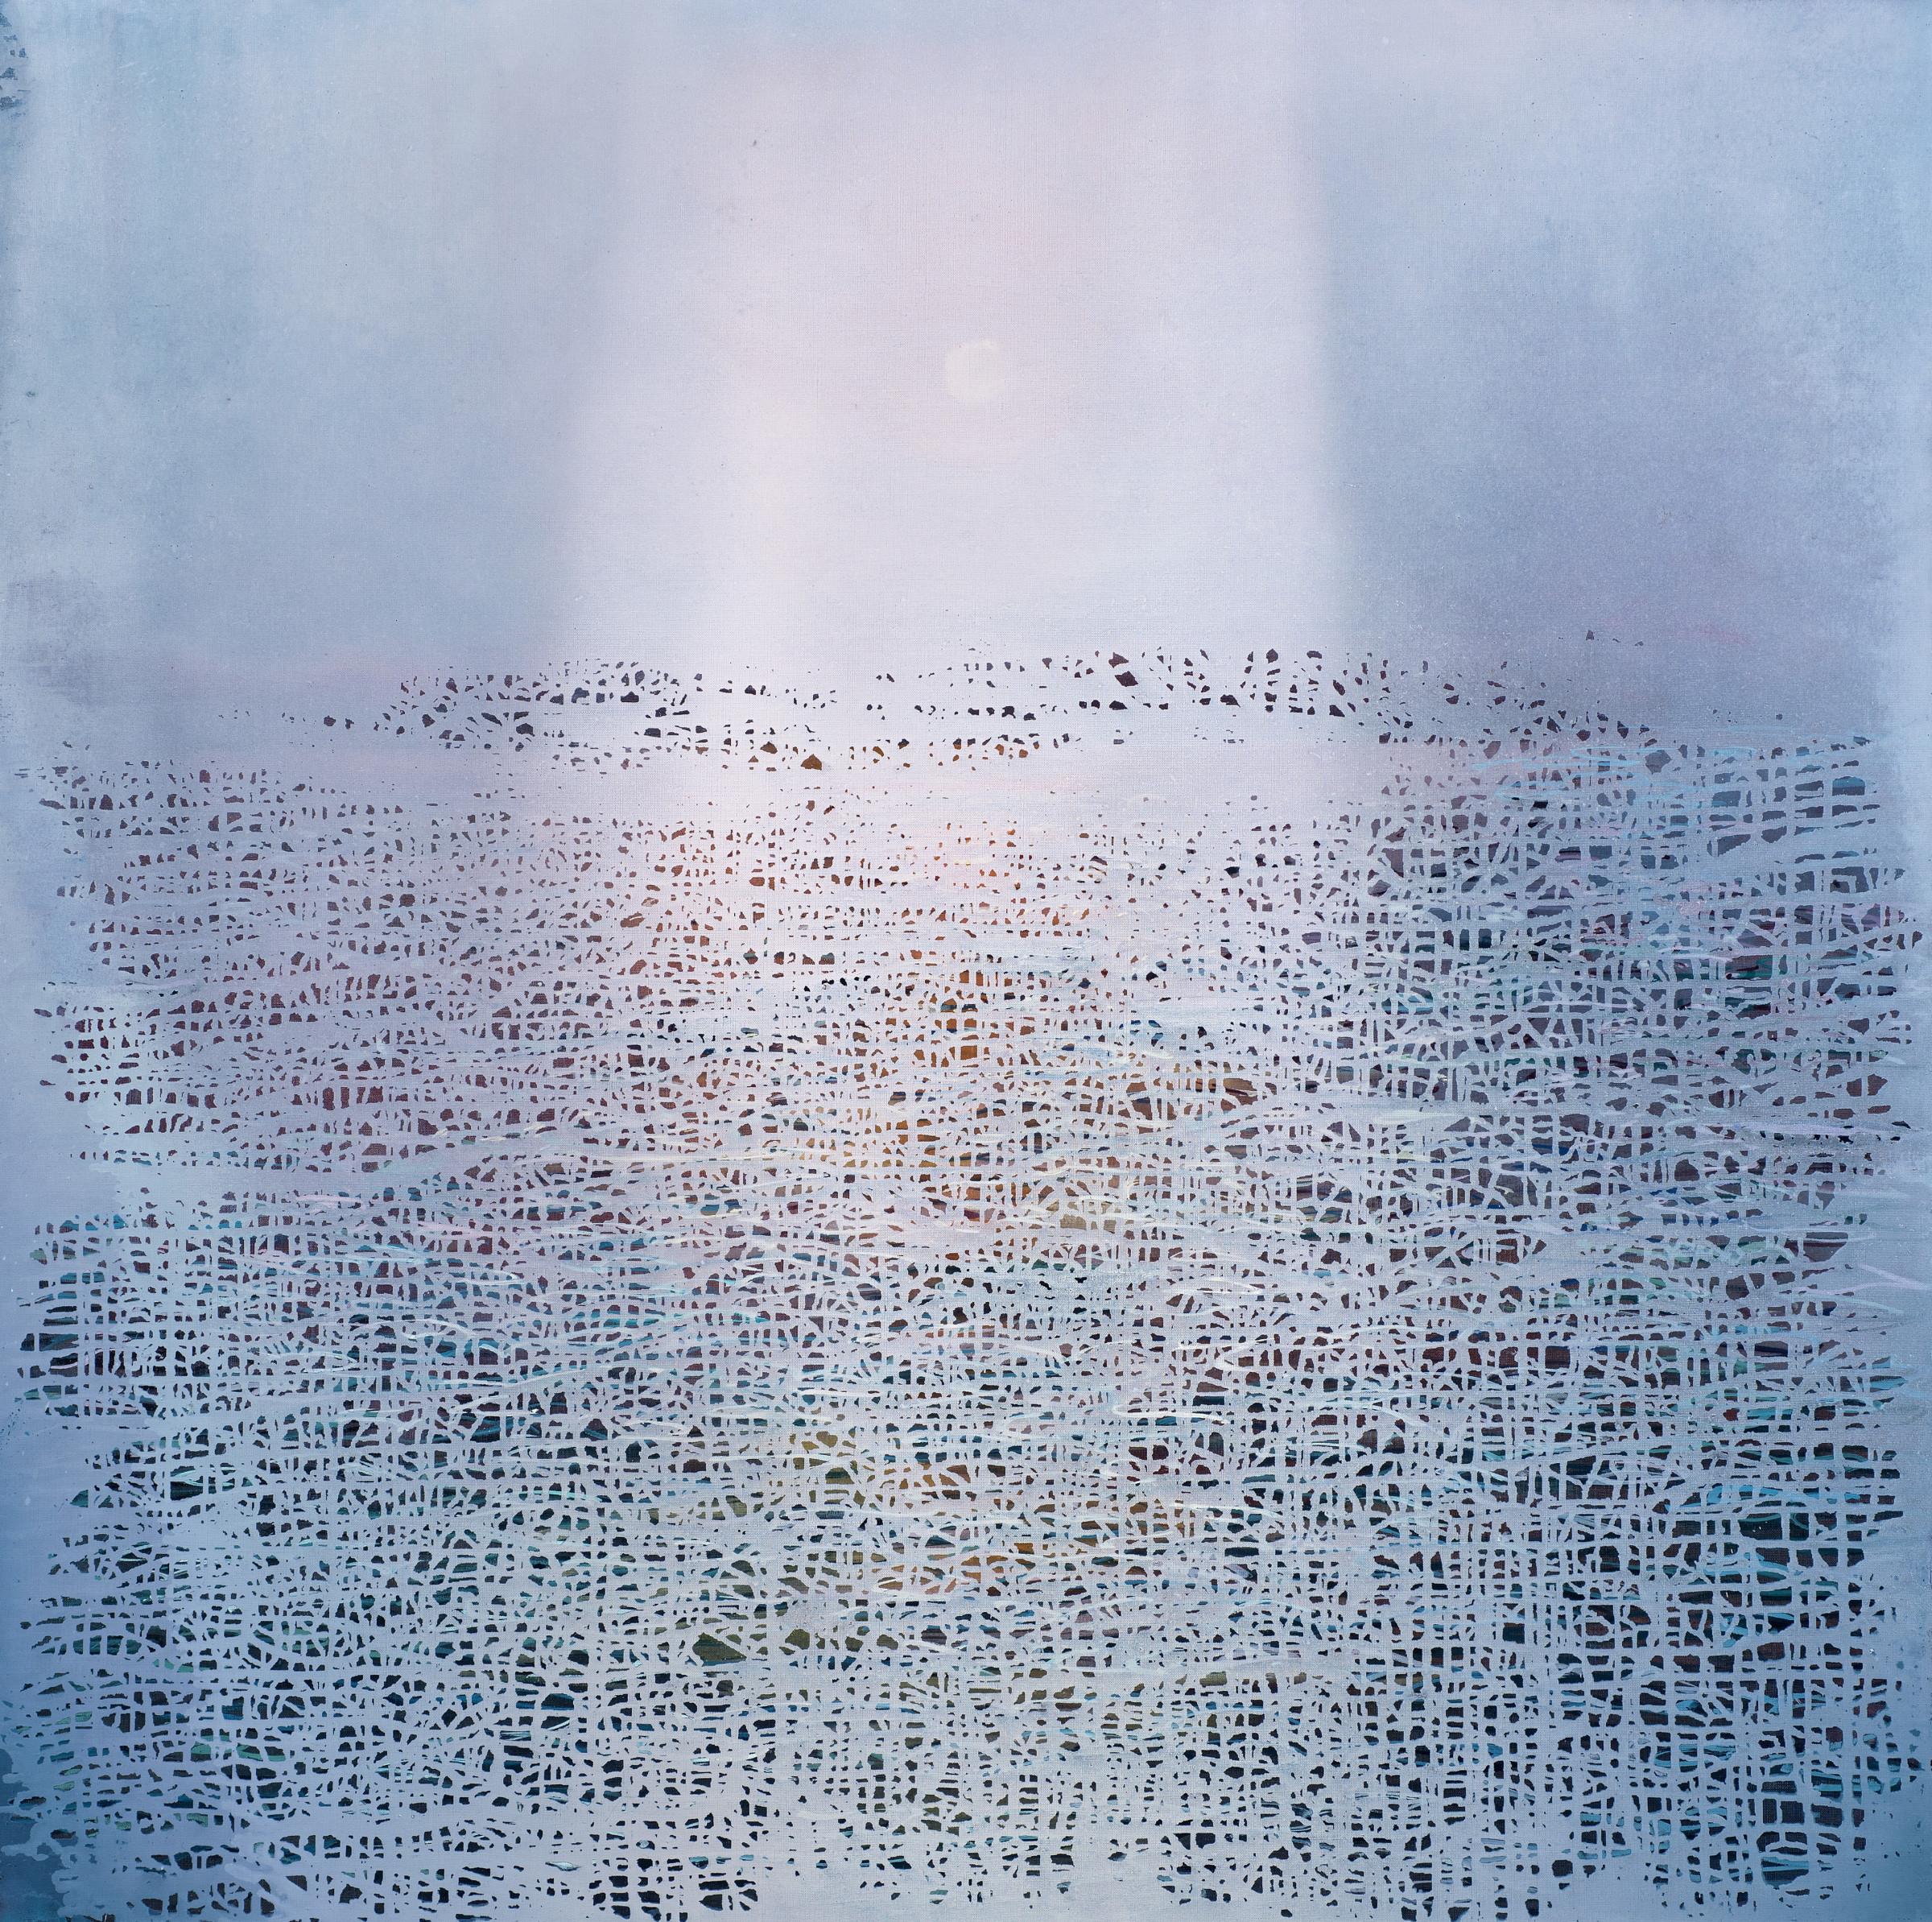 <span class=&#34;link fancybox-details-link&#34;><a href=&#34;/artists/71-luke-elwes/works/881/&#34;>View Detail Page</a></span><div class=&#34;artist&#34;><strong>Luke Elwes</strong></div> b.1961 <div class=&#34;title&#34;><em>Ganga 12</em>, 2018</div> <div class=&#34;signed_and_dated&#34;>signed and dated verso </div> <div class=&#34;medium&#34;>oil on canvas</div> <div class=&#34;dimensions&#34;>120 x 120cm</div><div class=&#34;copyright_line&#34;>Copyright the artist</div>